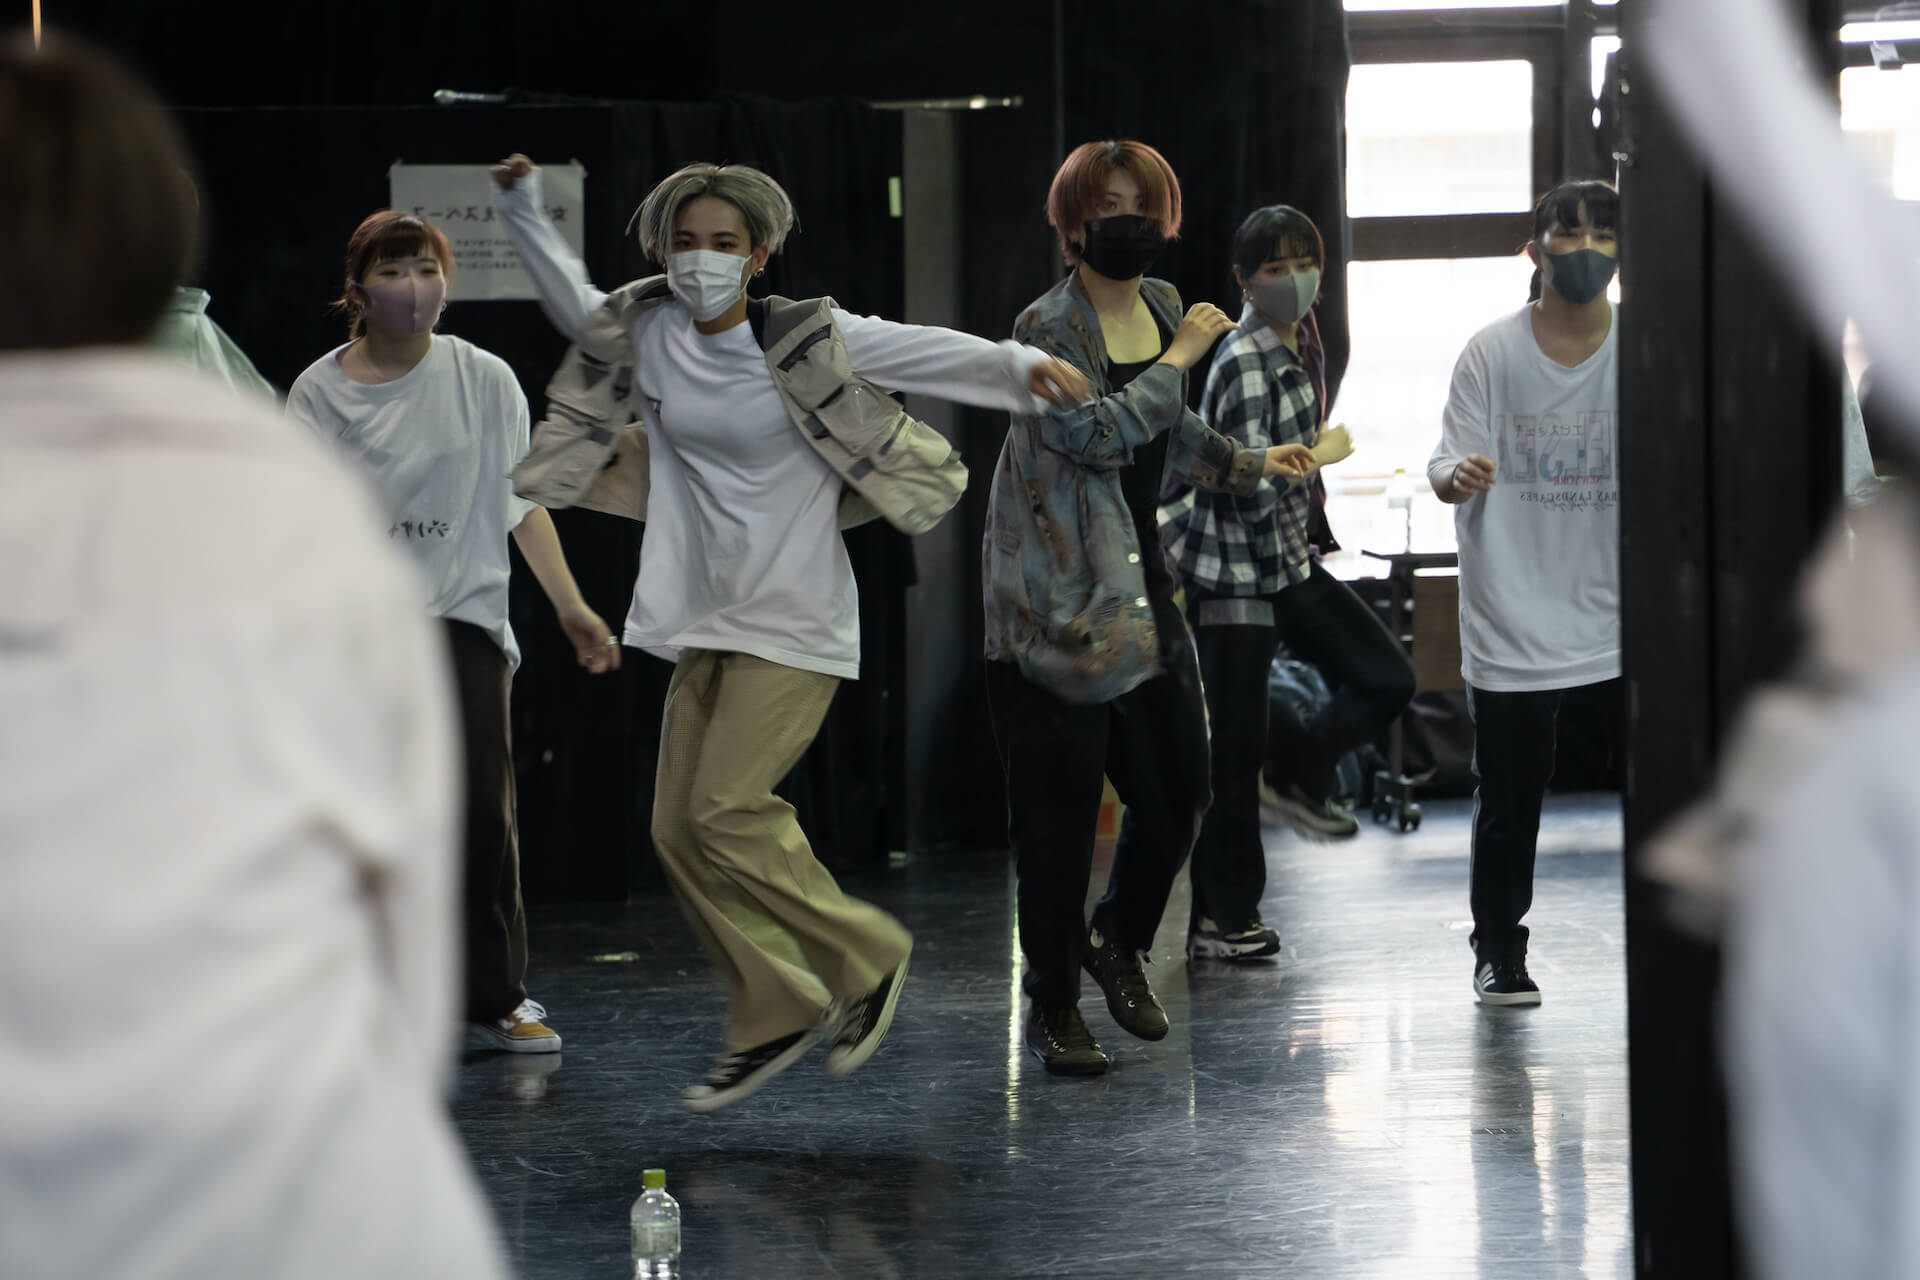 <Dance Dance Dance @ YOKOHAMA2021>でTENDREとyurinasiaが共演!ダンサーの公募も music210618_dancedanceyokohama6